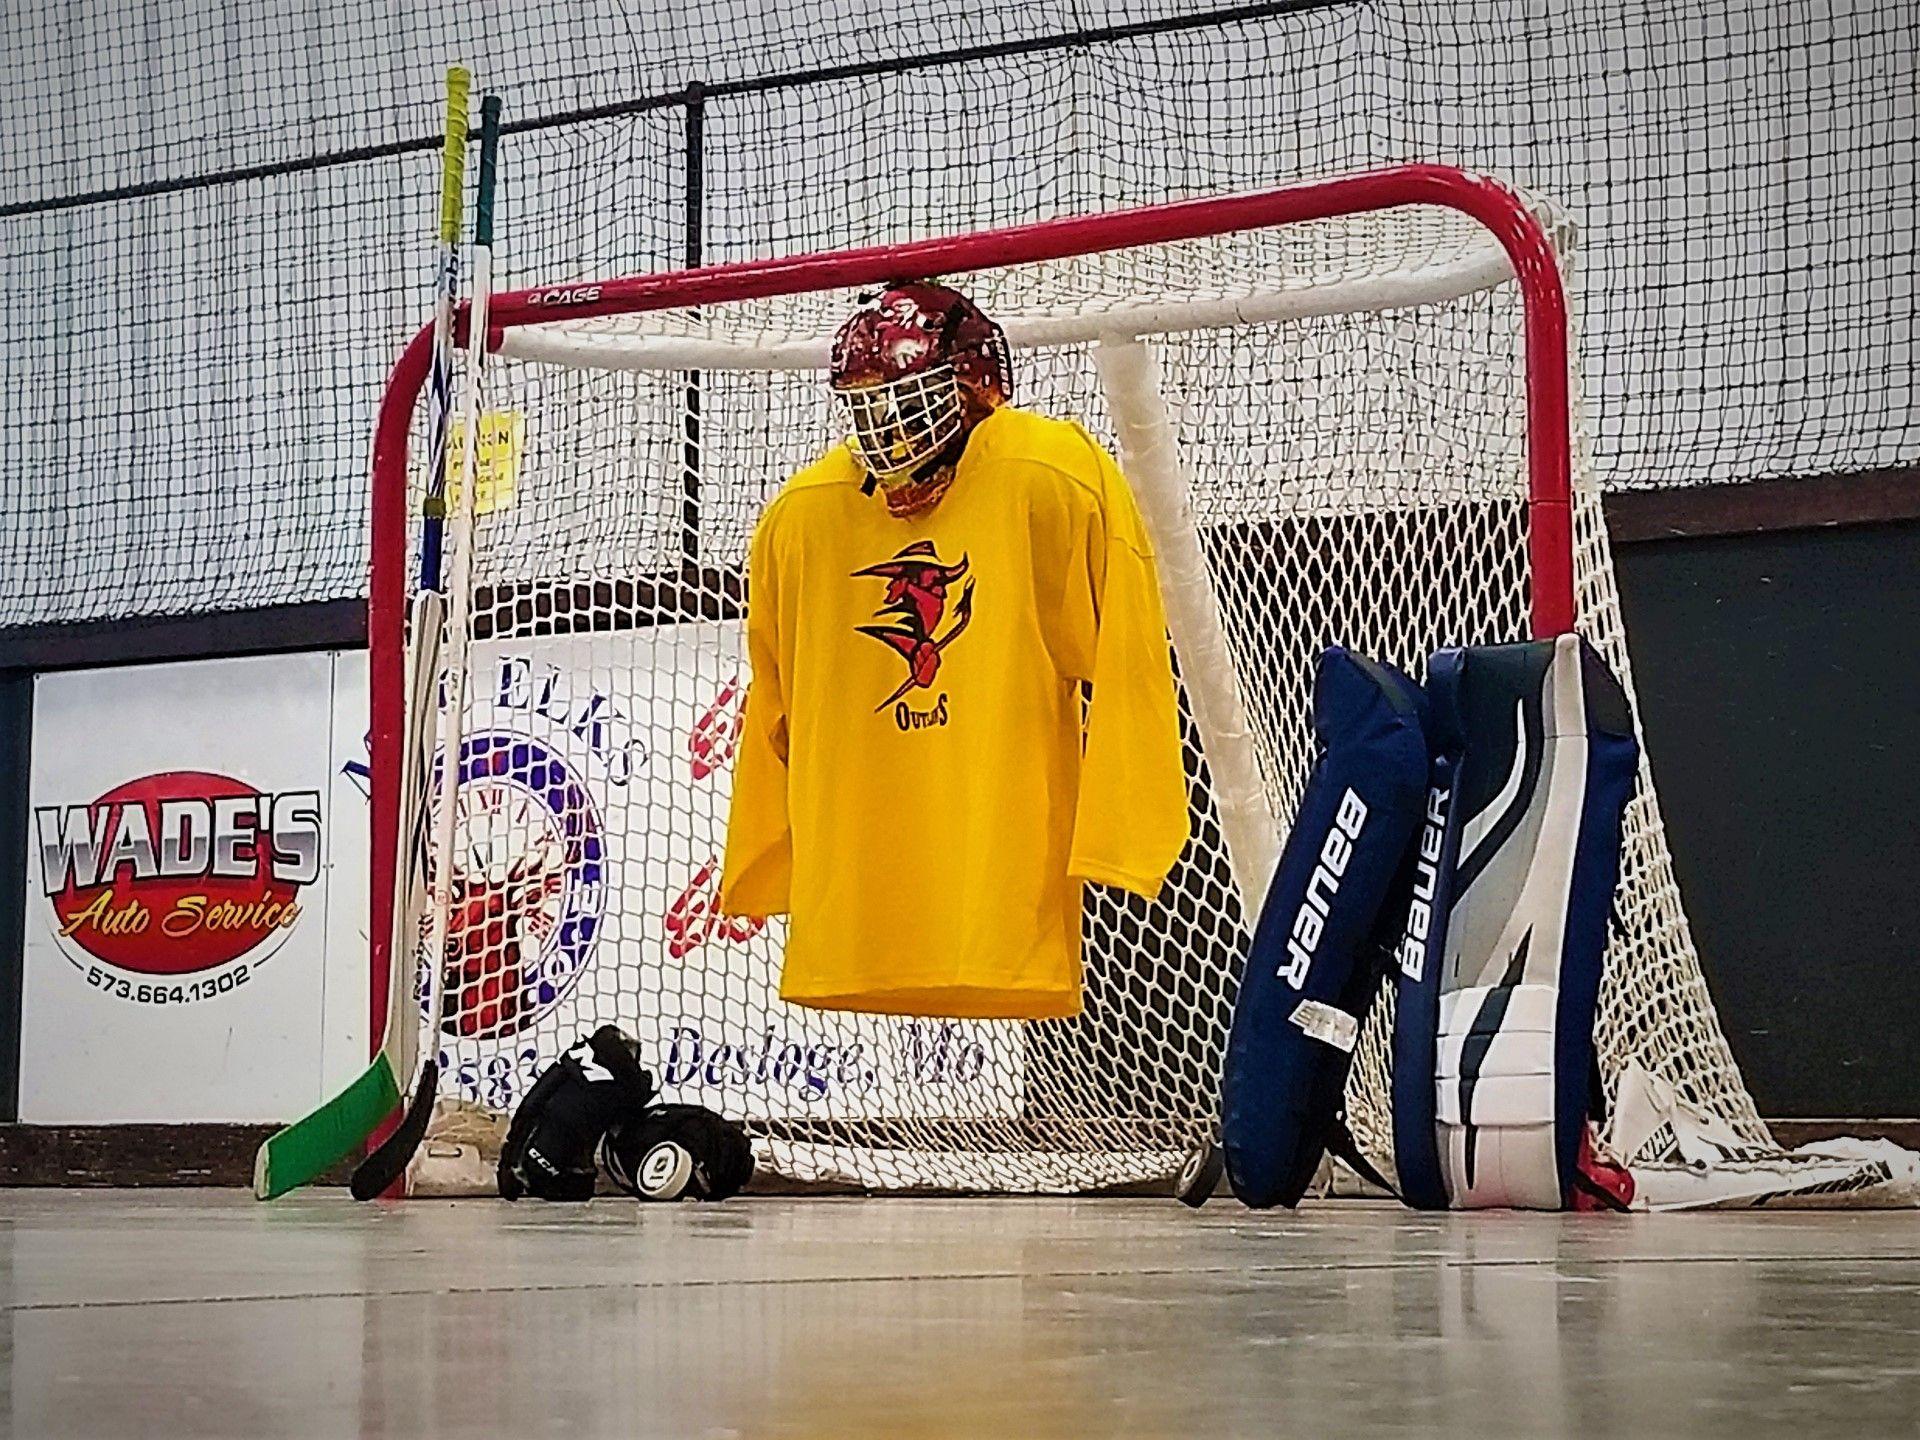 Hockey Gear - Right Side View 1 V.jpg